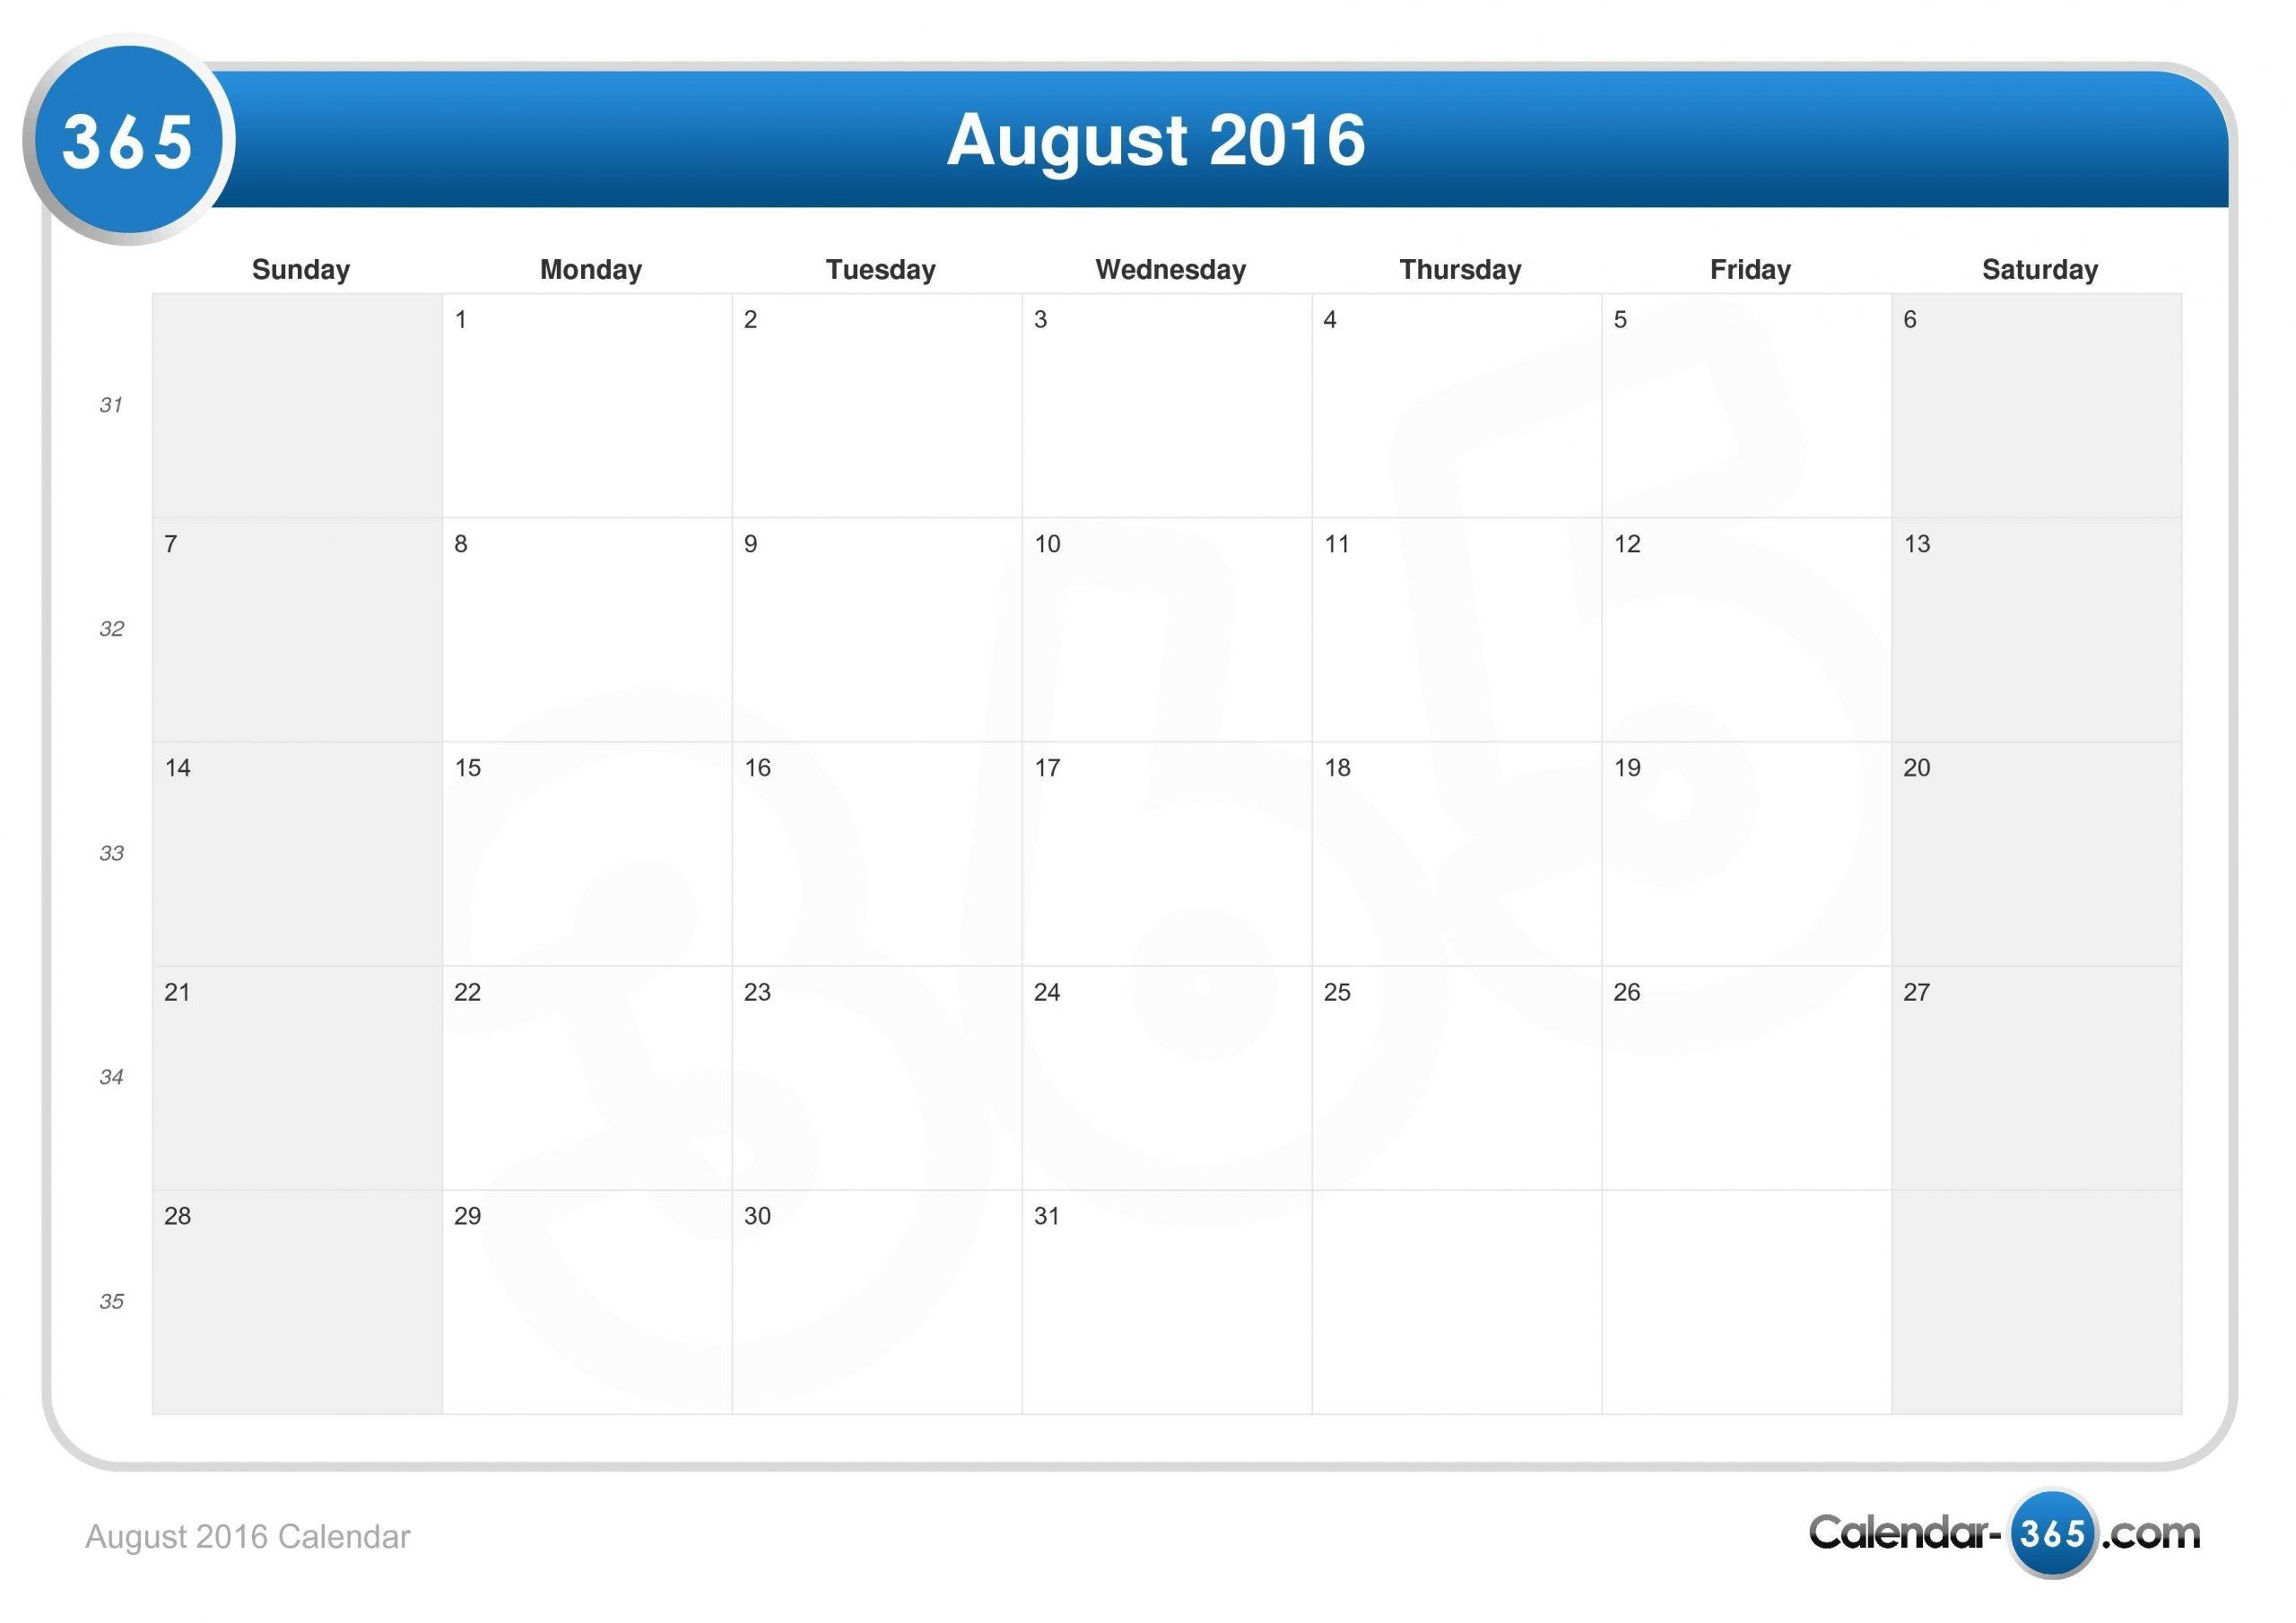 Catch August 19 Calender